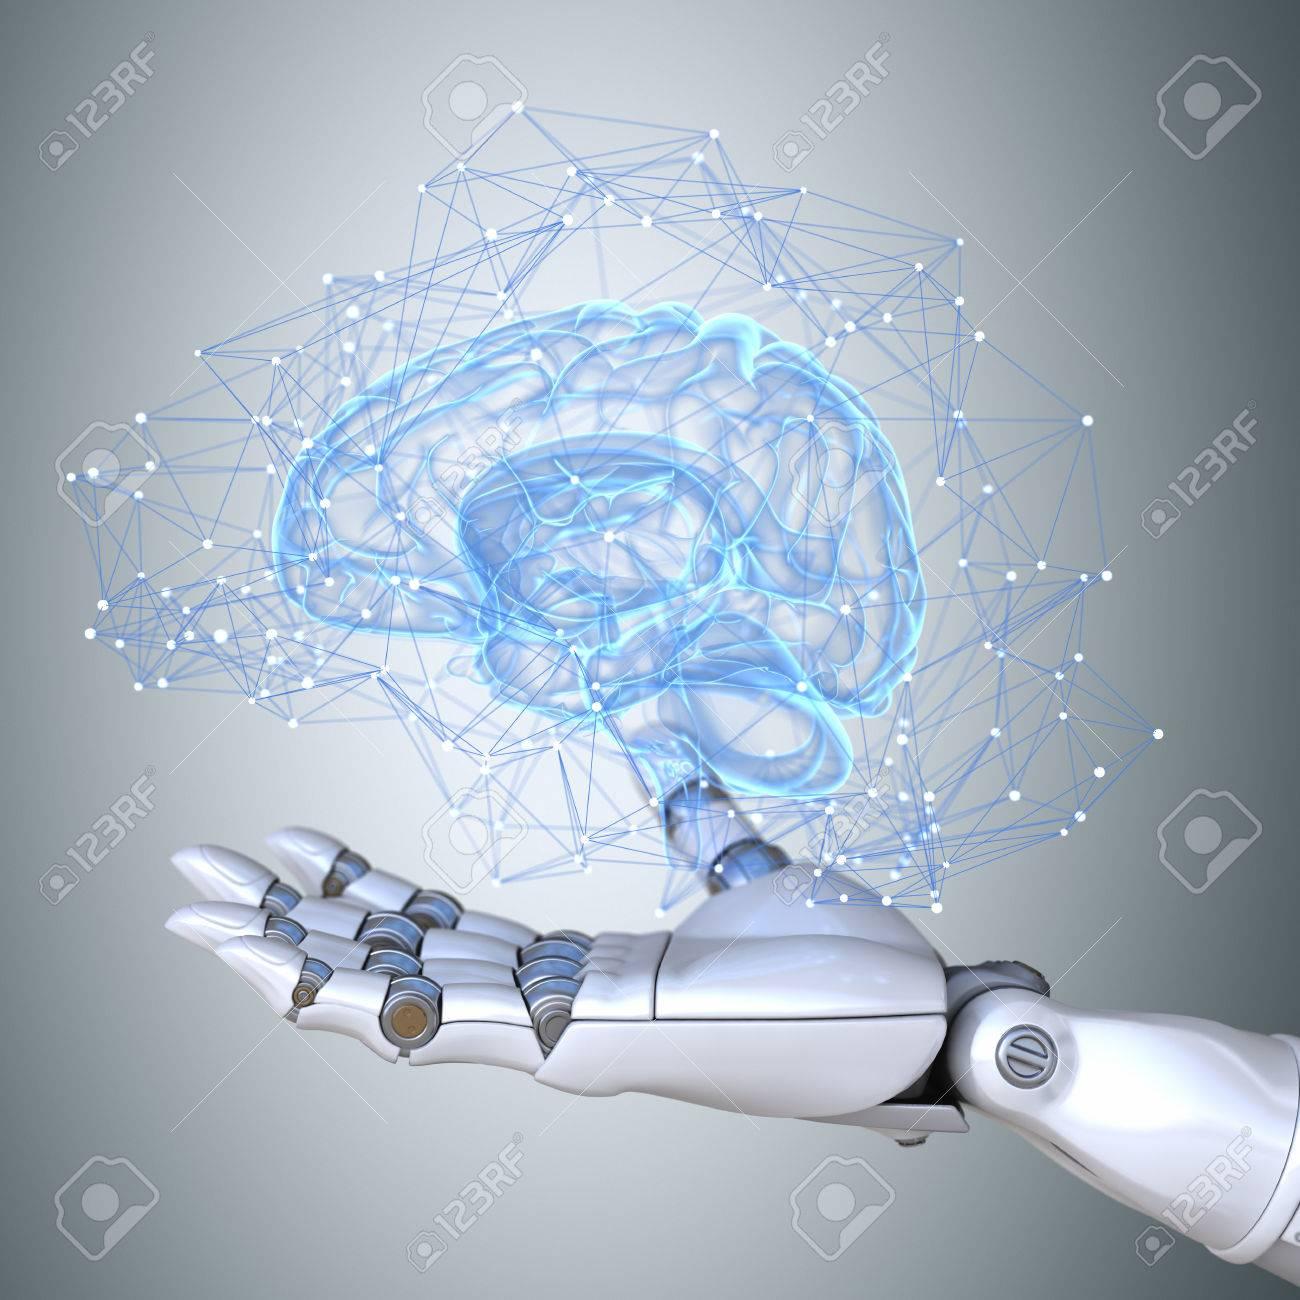 Robot hand holding virtual brain scheme - 67205815